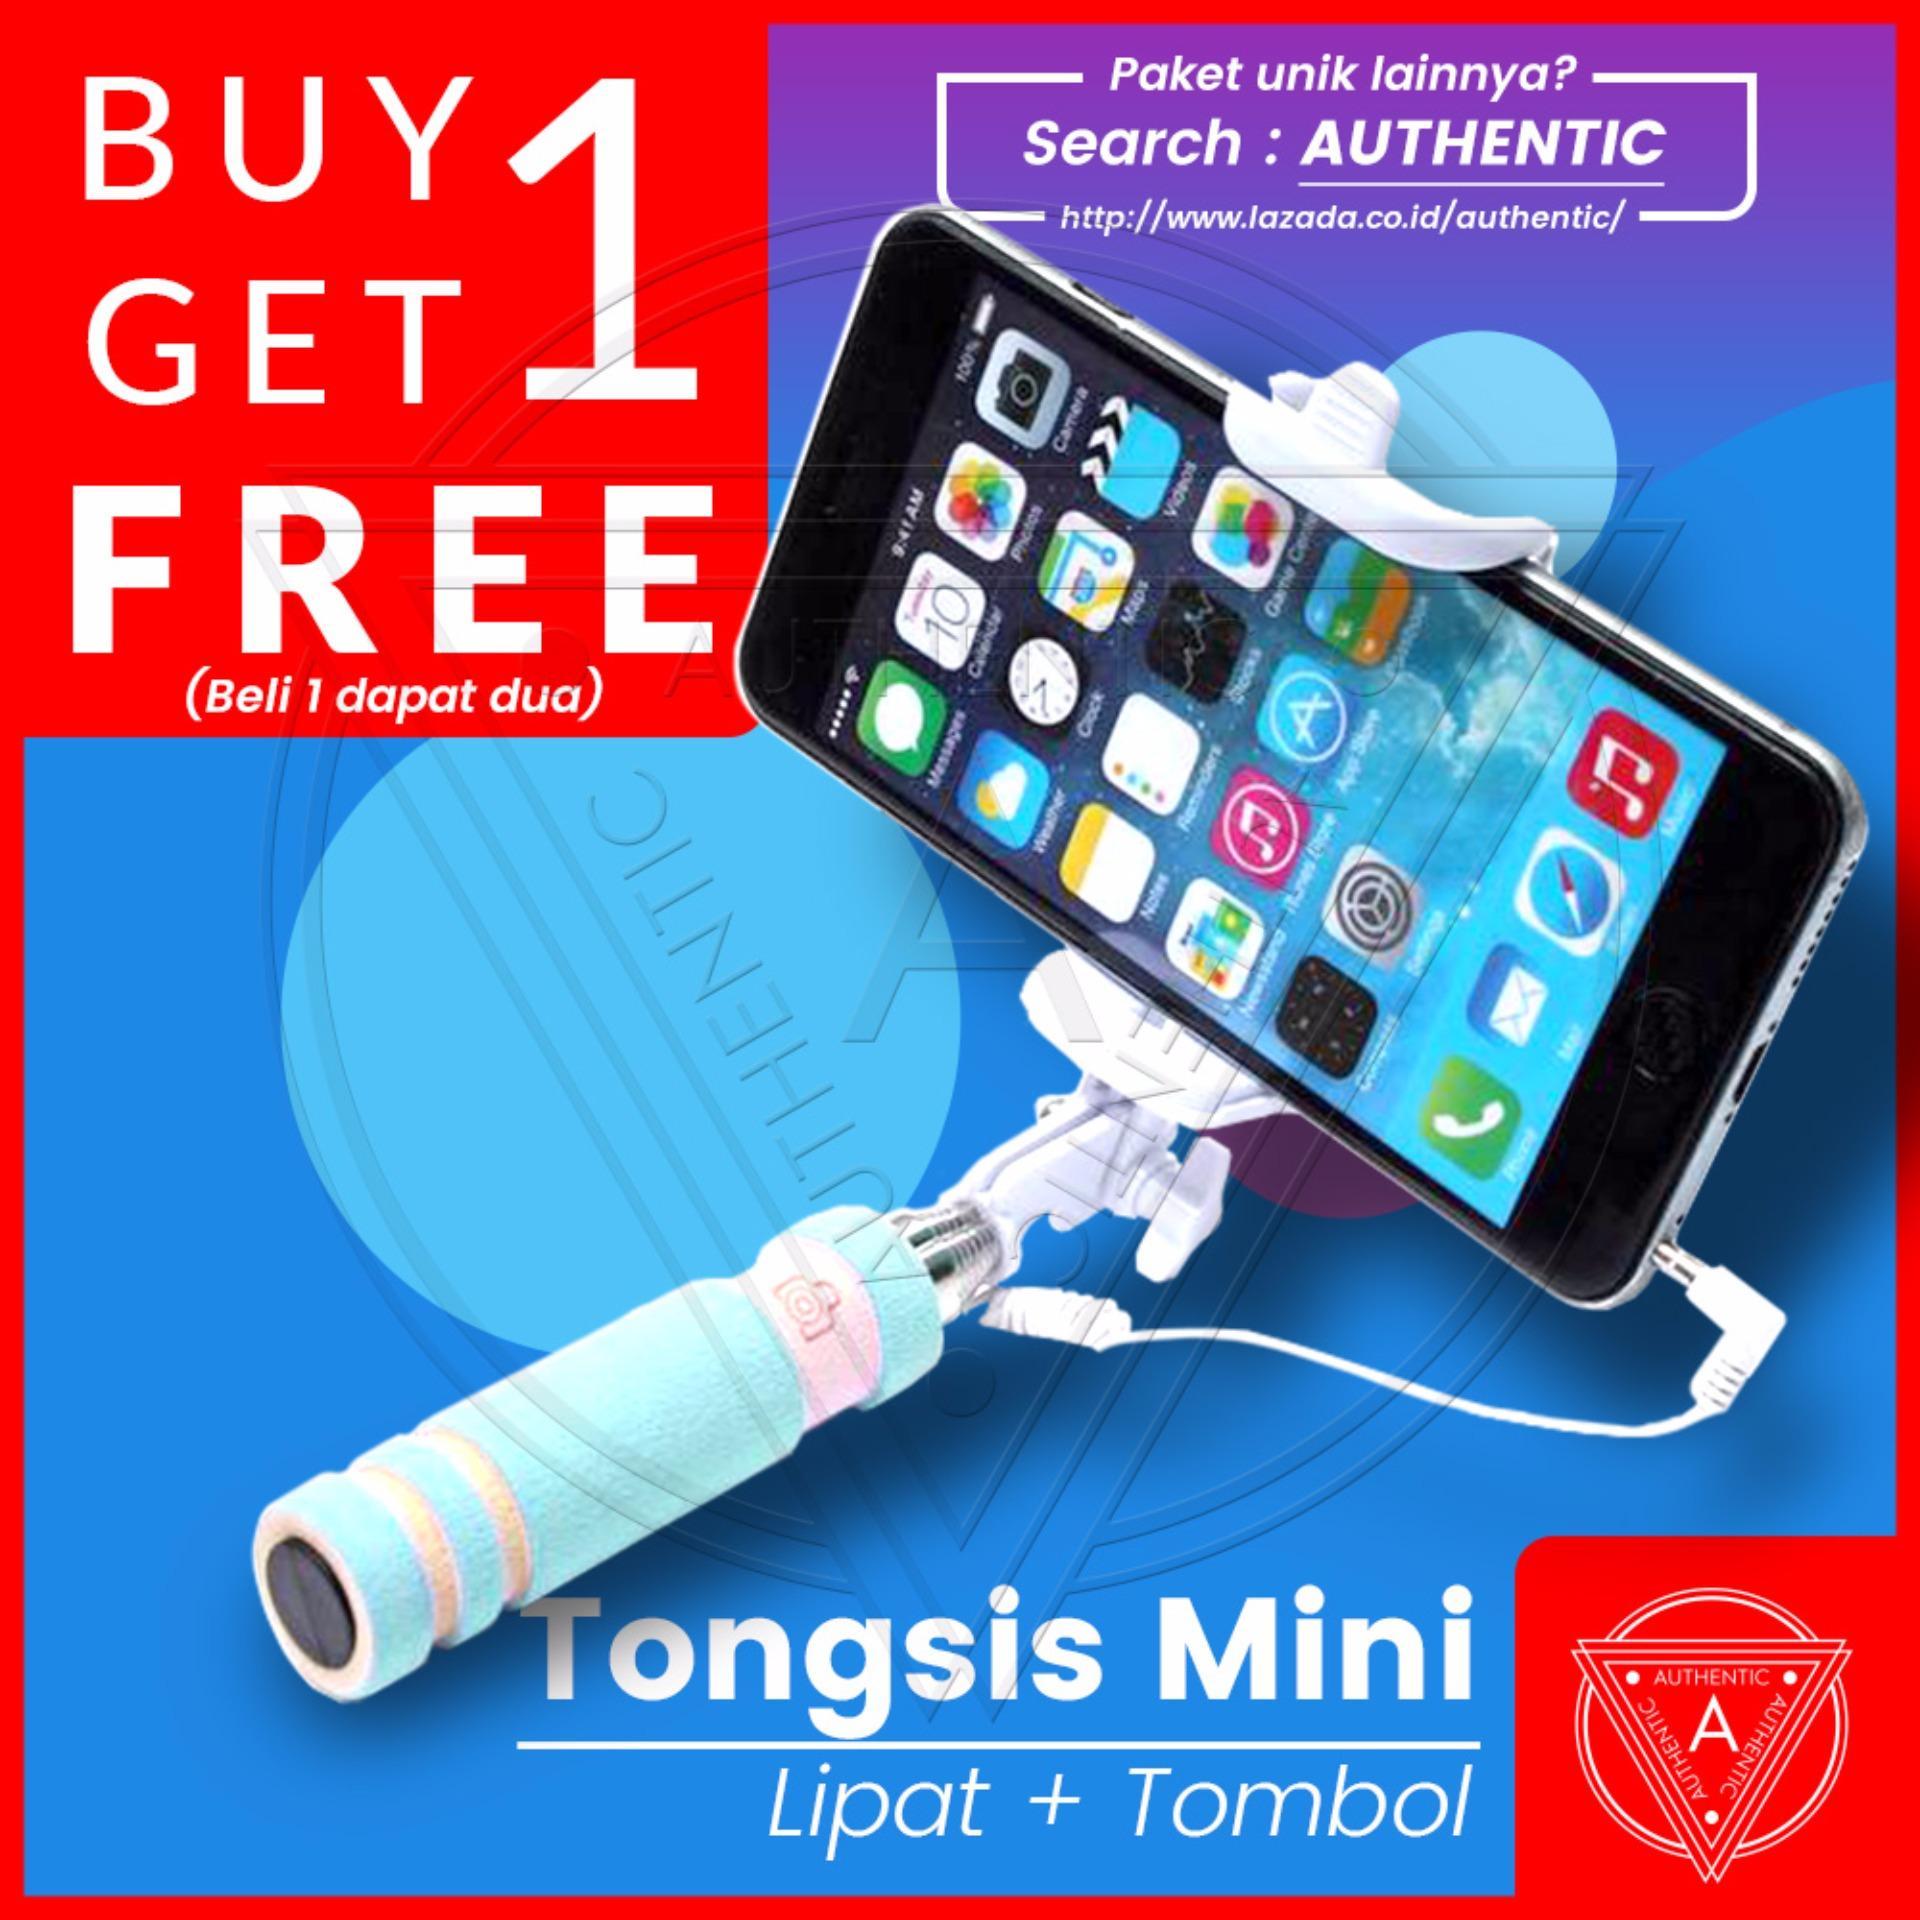 Authentic Tongsis Lipat Mini Tombol Kabel Monopod - Buy 1 Get 1